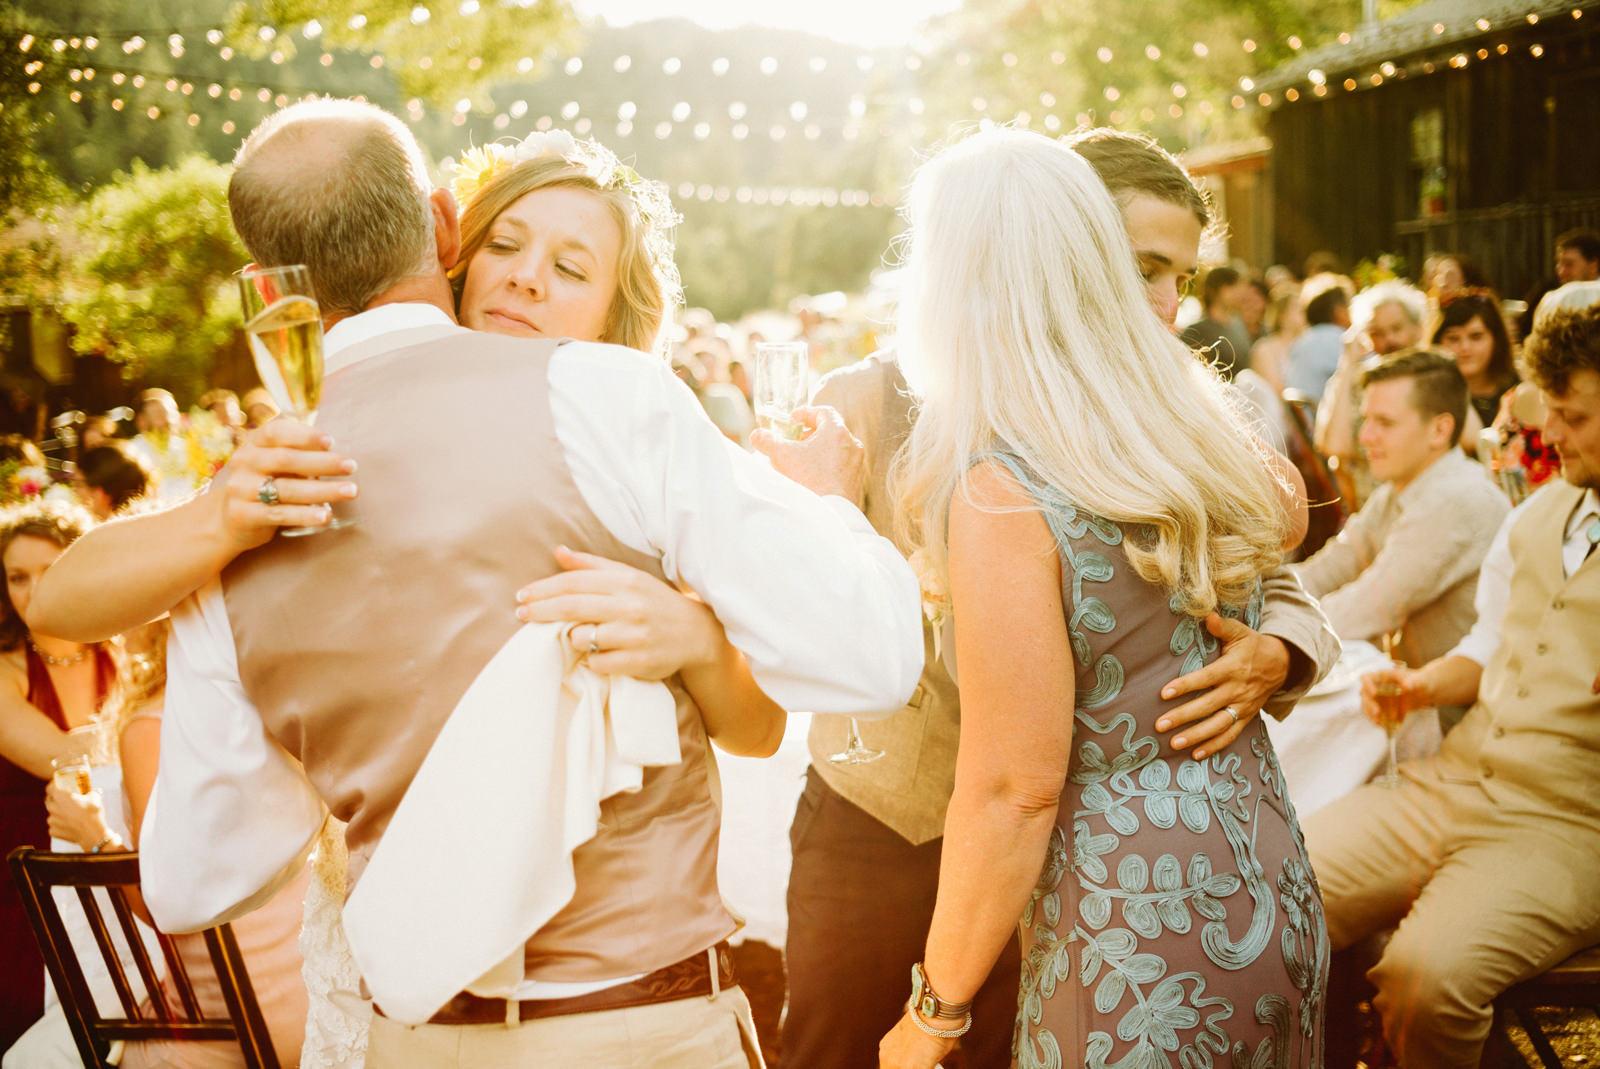 rivers-bend-retreat-wedding-080 RIVER'S BEND RETREAT WEDDING